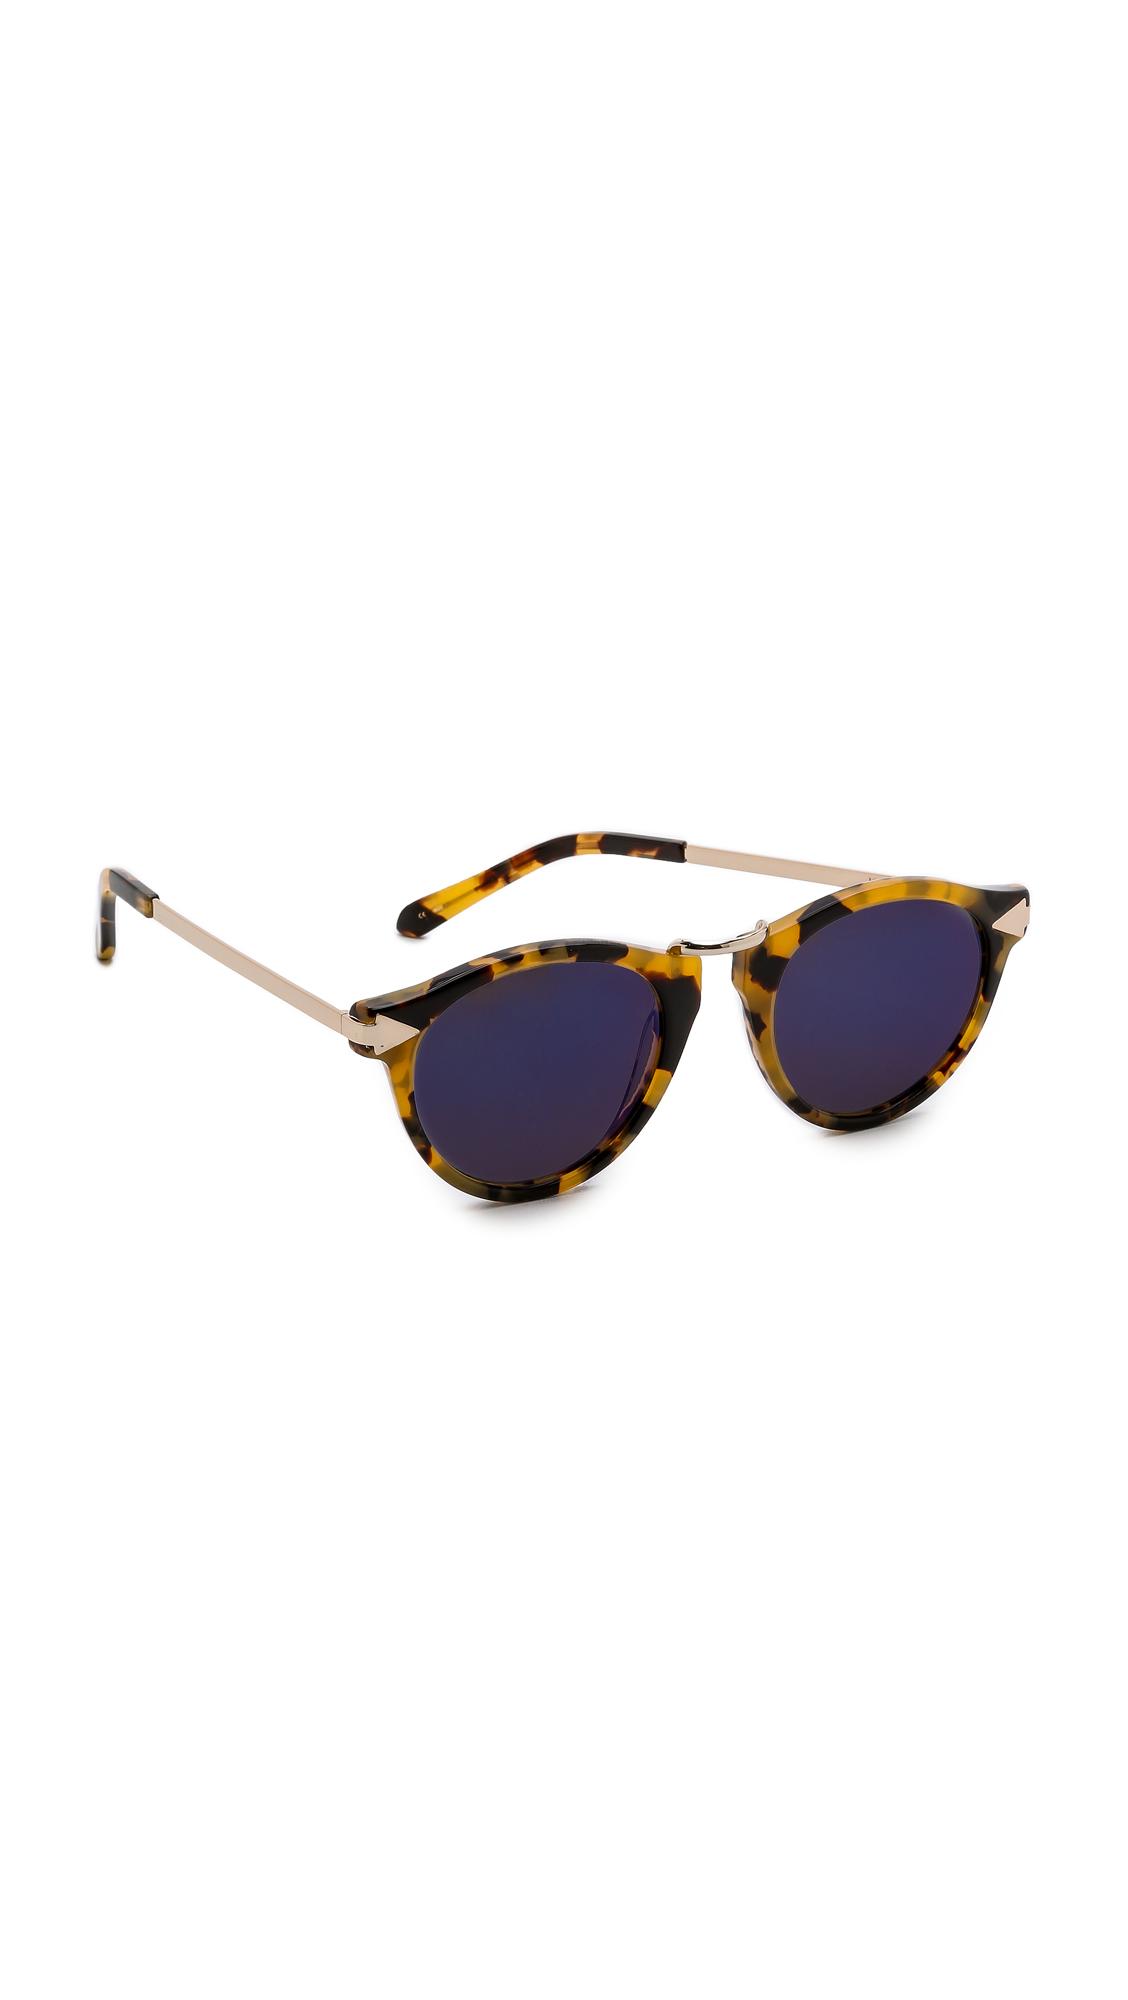 Karen Walker Superstars Collection Helter Skelter Mirrored Sunglasses - Crazy Tort/blue Revo in Brown